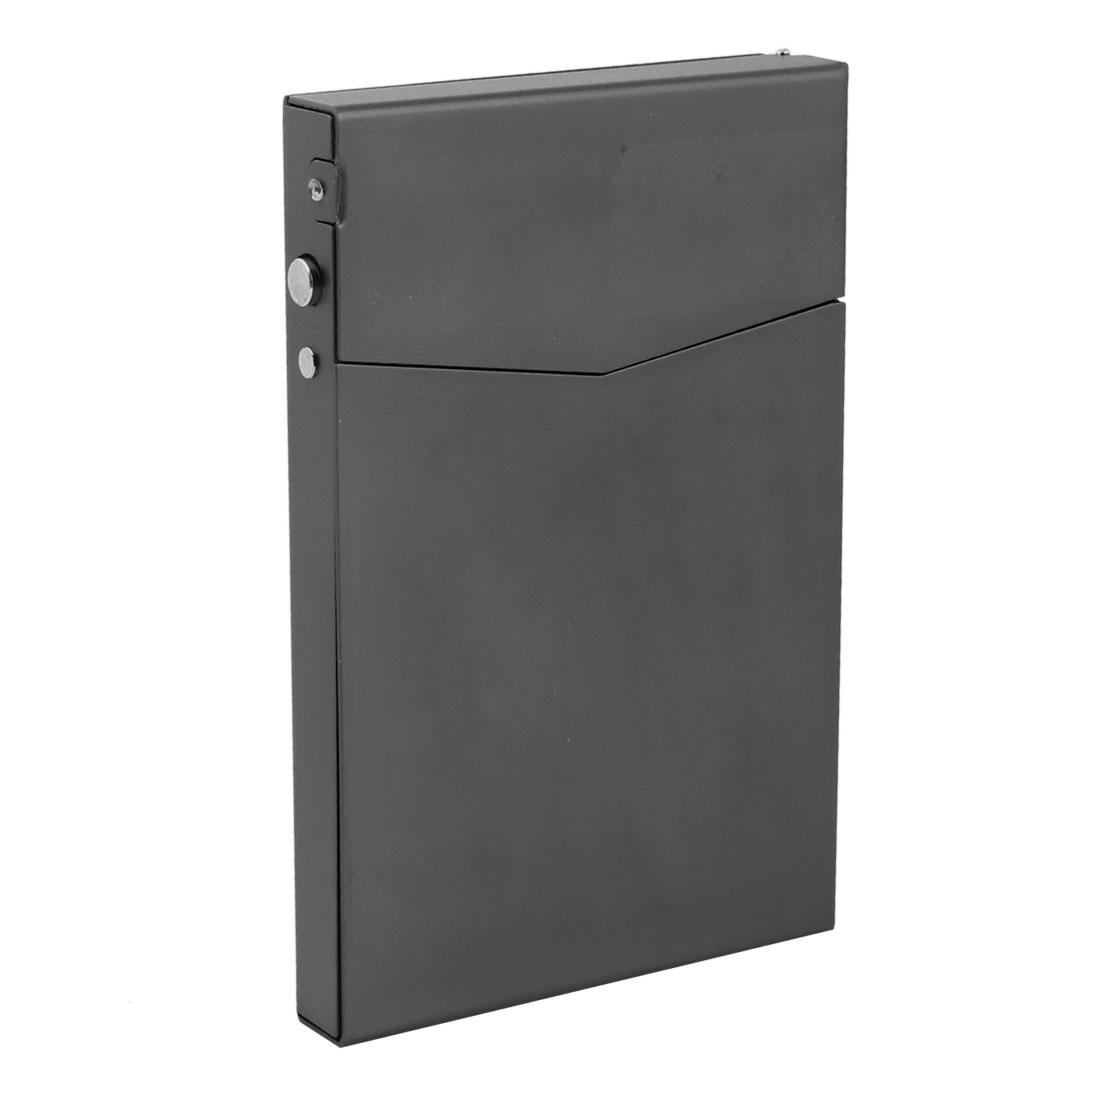 9.2cm x 6cm Aluminium Business Name Cards Organizer Box Gray